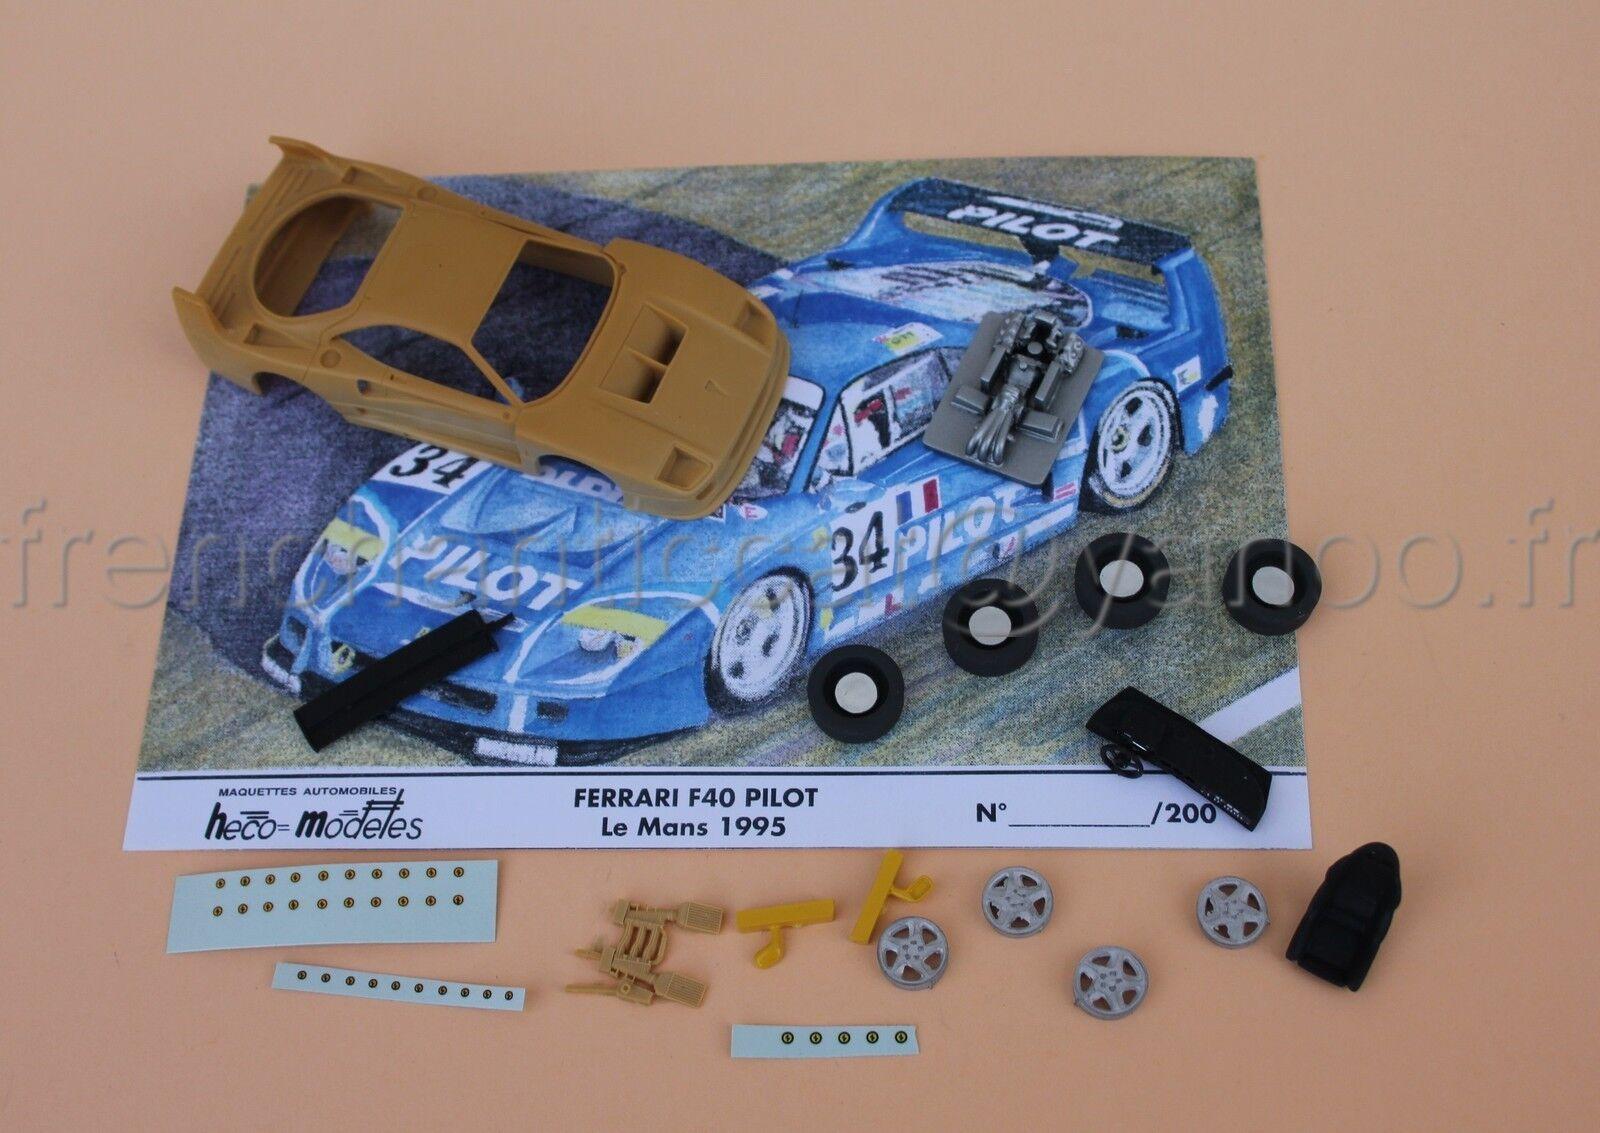 KG Voiture Ferrari F40 Le mans resine miniature collector 1 43 Heco modeles